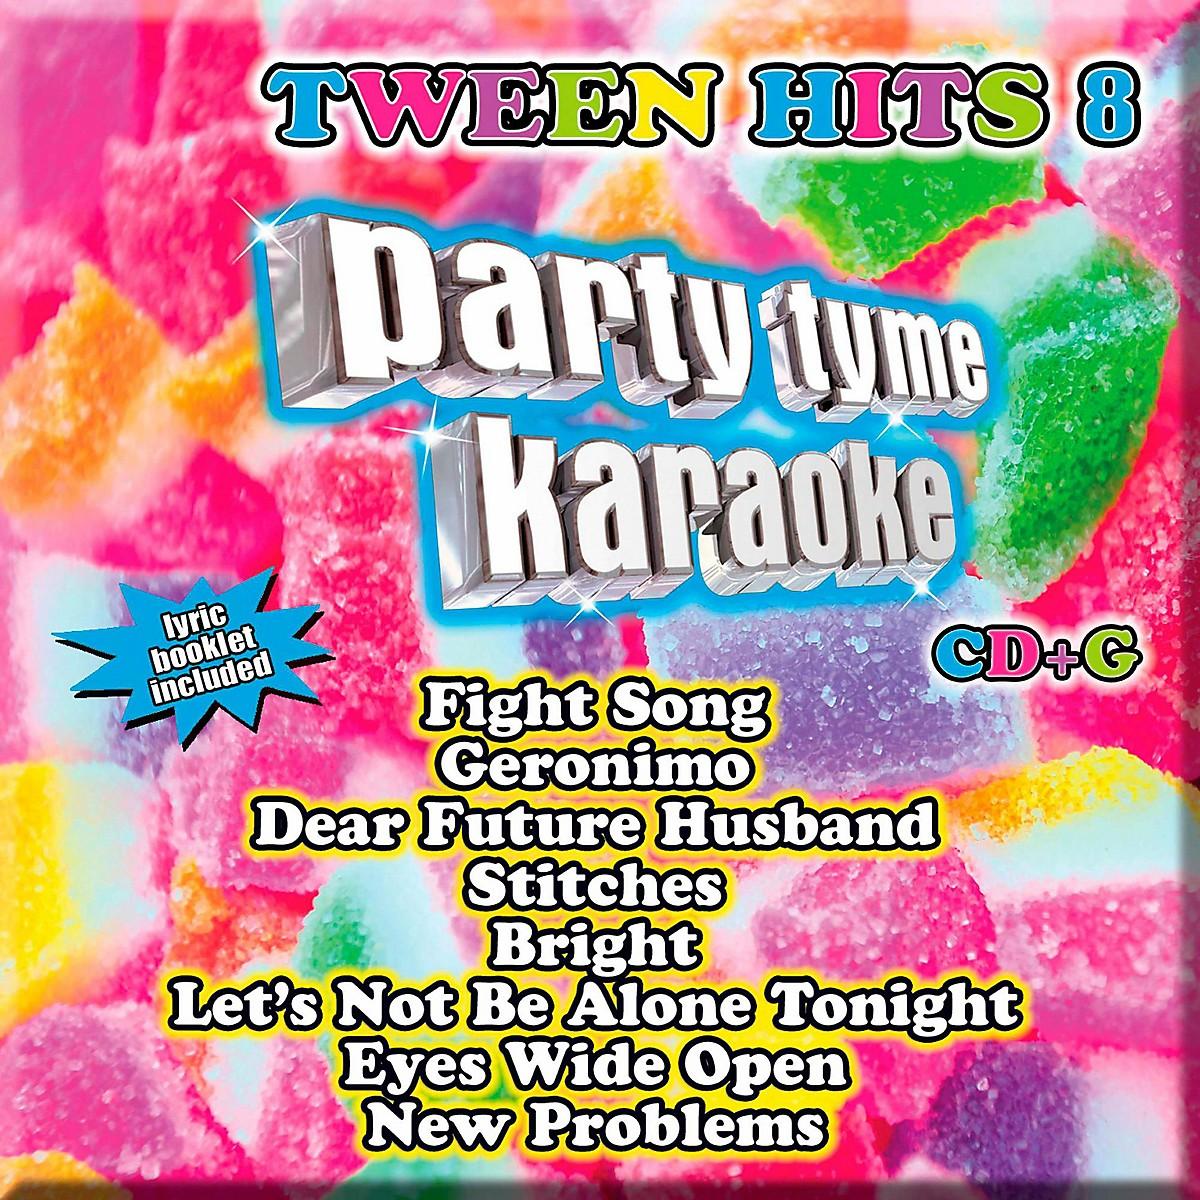 Sybersound Party Tyme Karaoke - Tween Hits 8